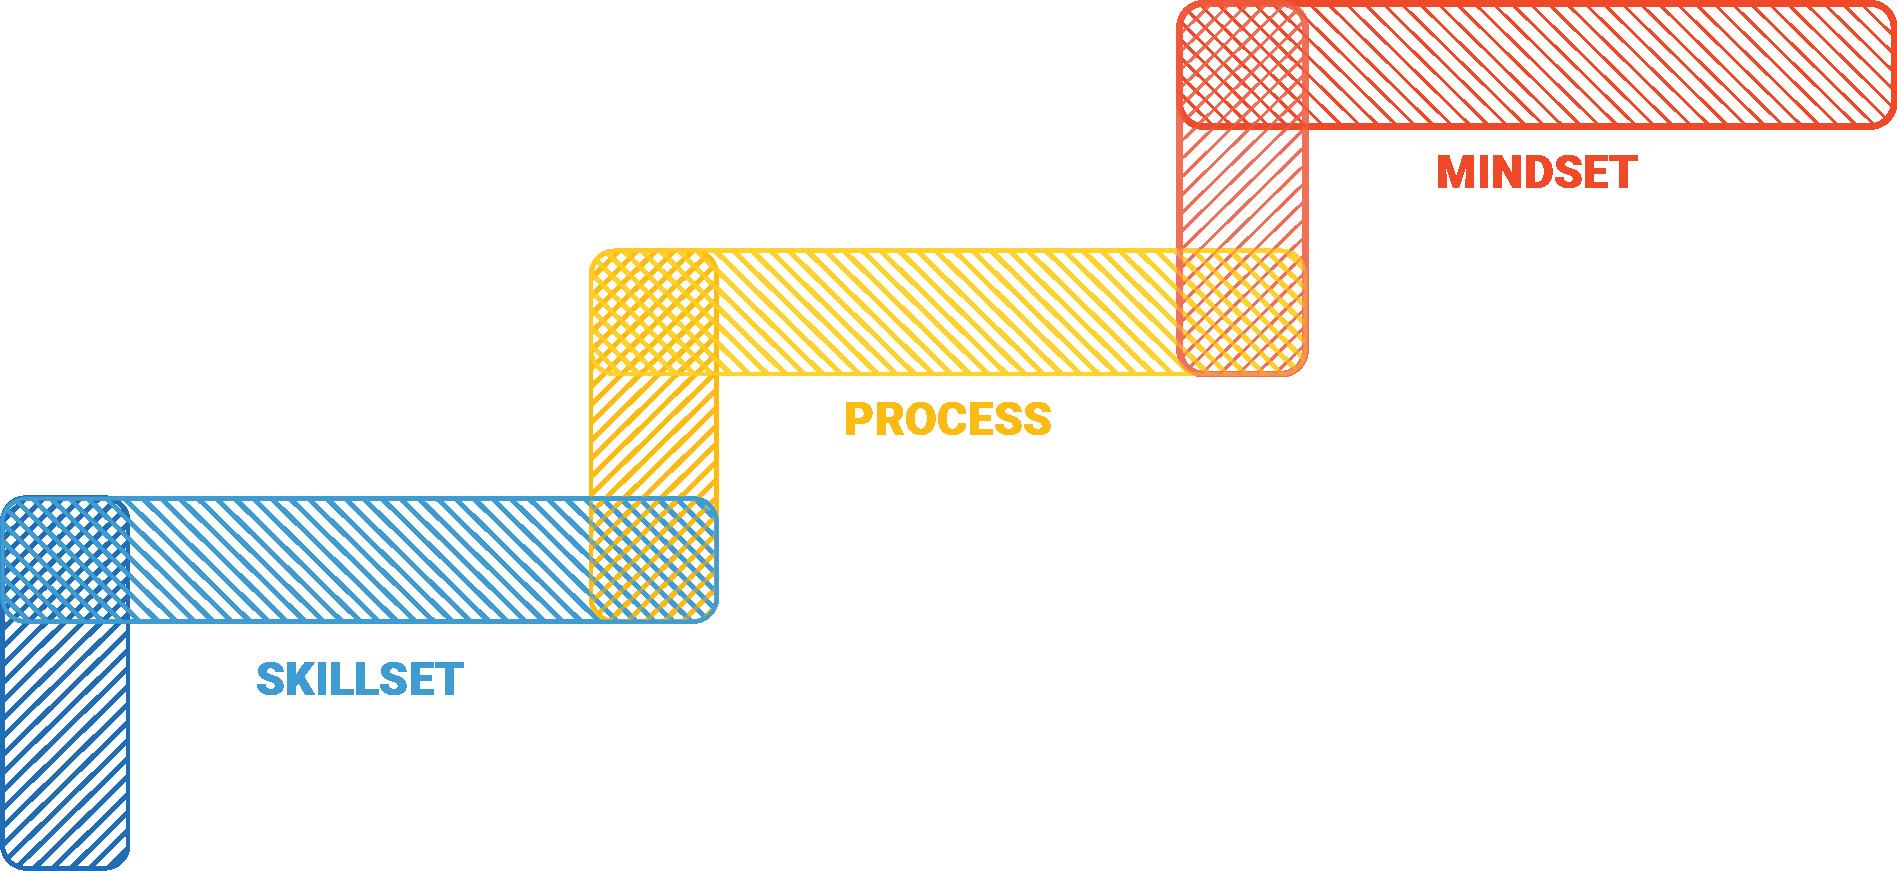 Skillset Process Mindset as stepping stones